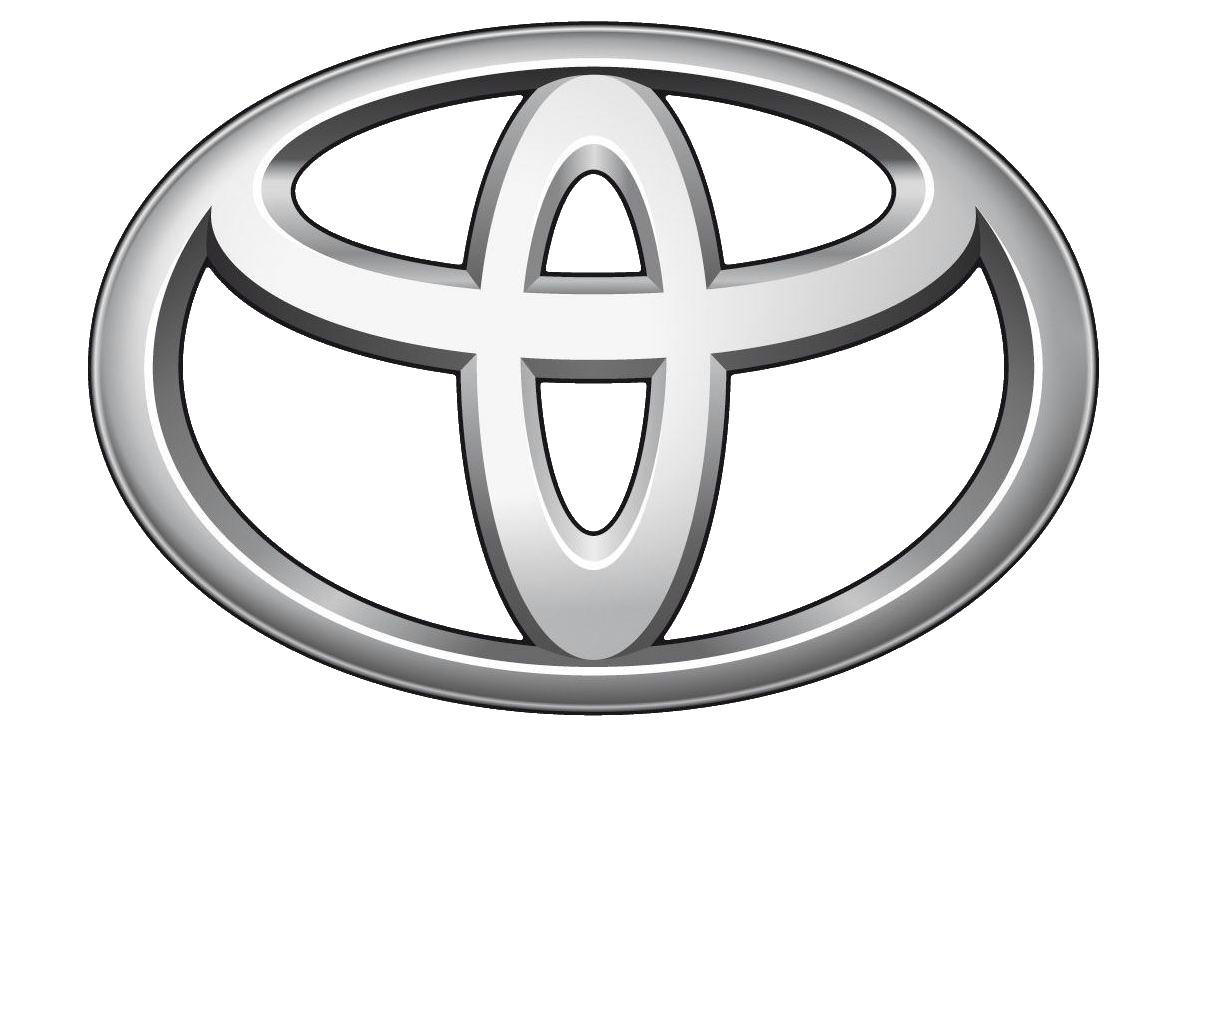 Тойота PNG фото скачать, Toyota car logo PNG